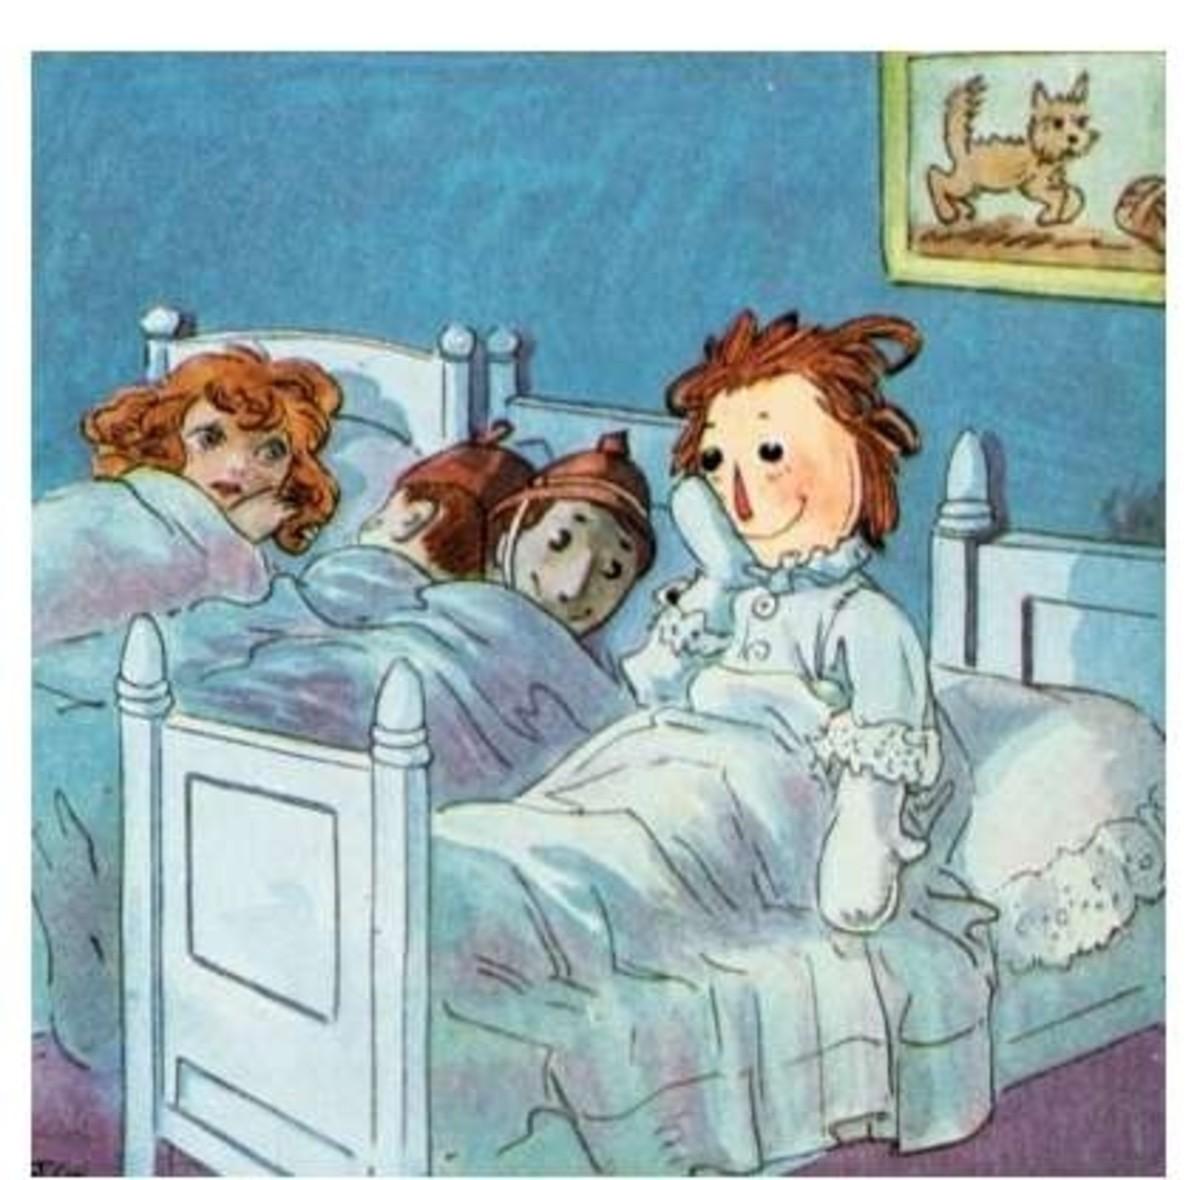 Good night, Raggedy Anne!